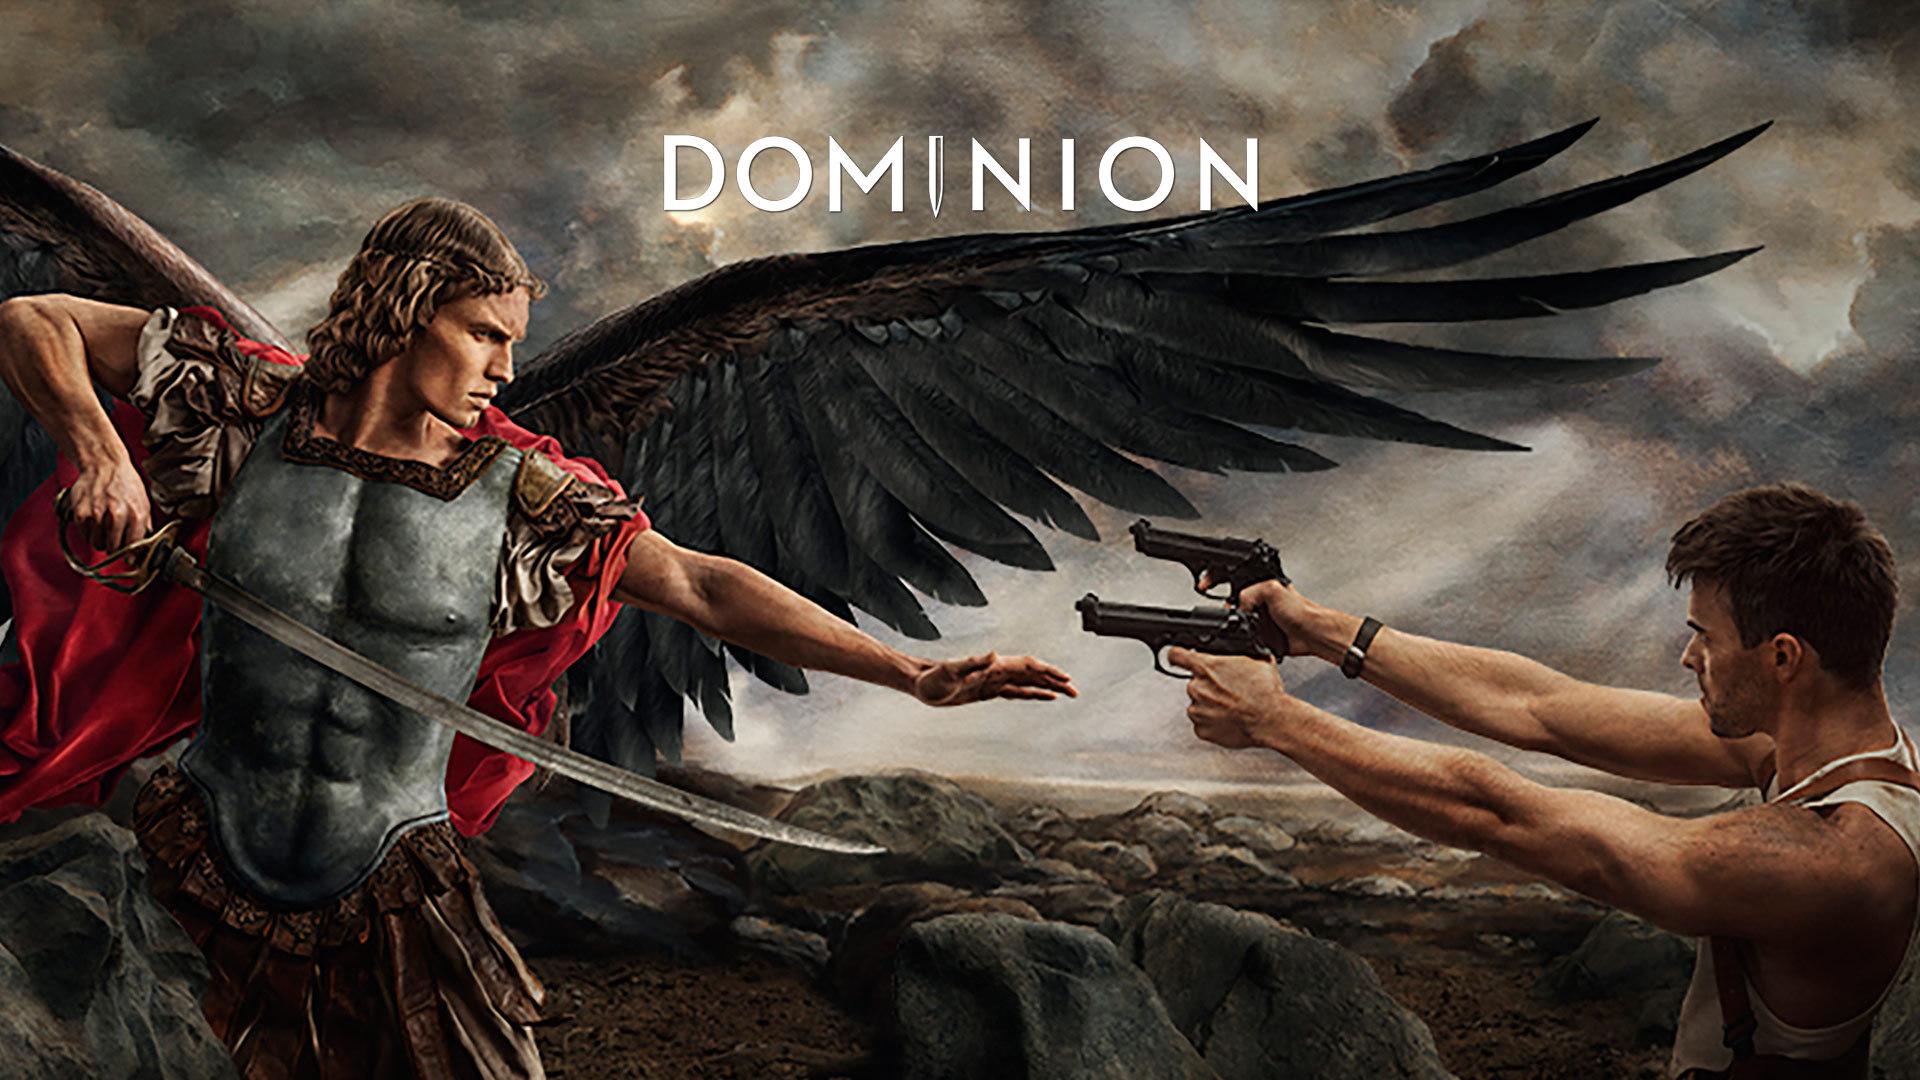 Dominion, Season 1